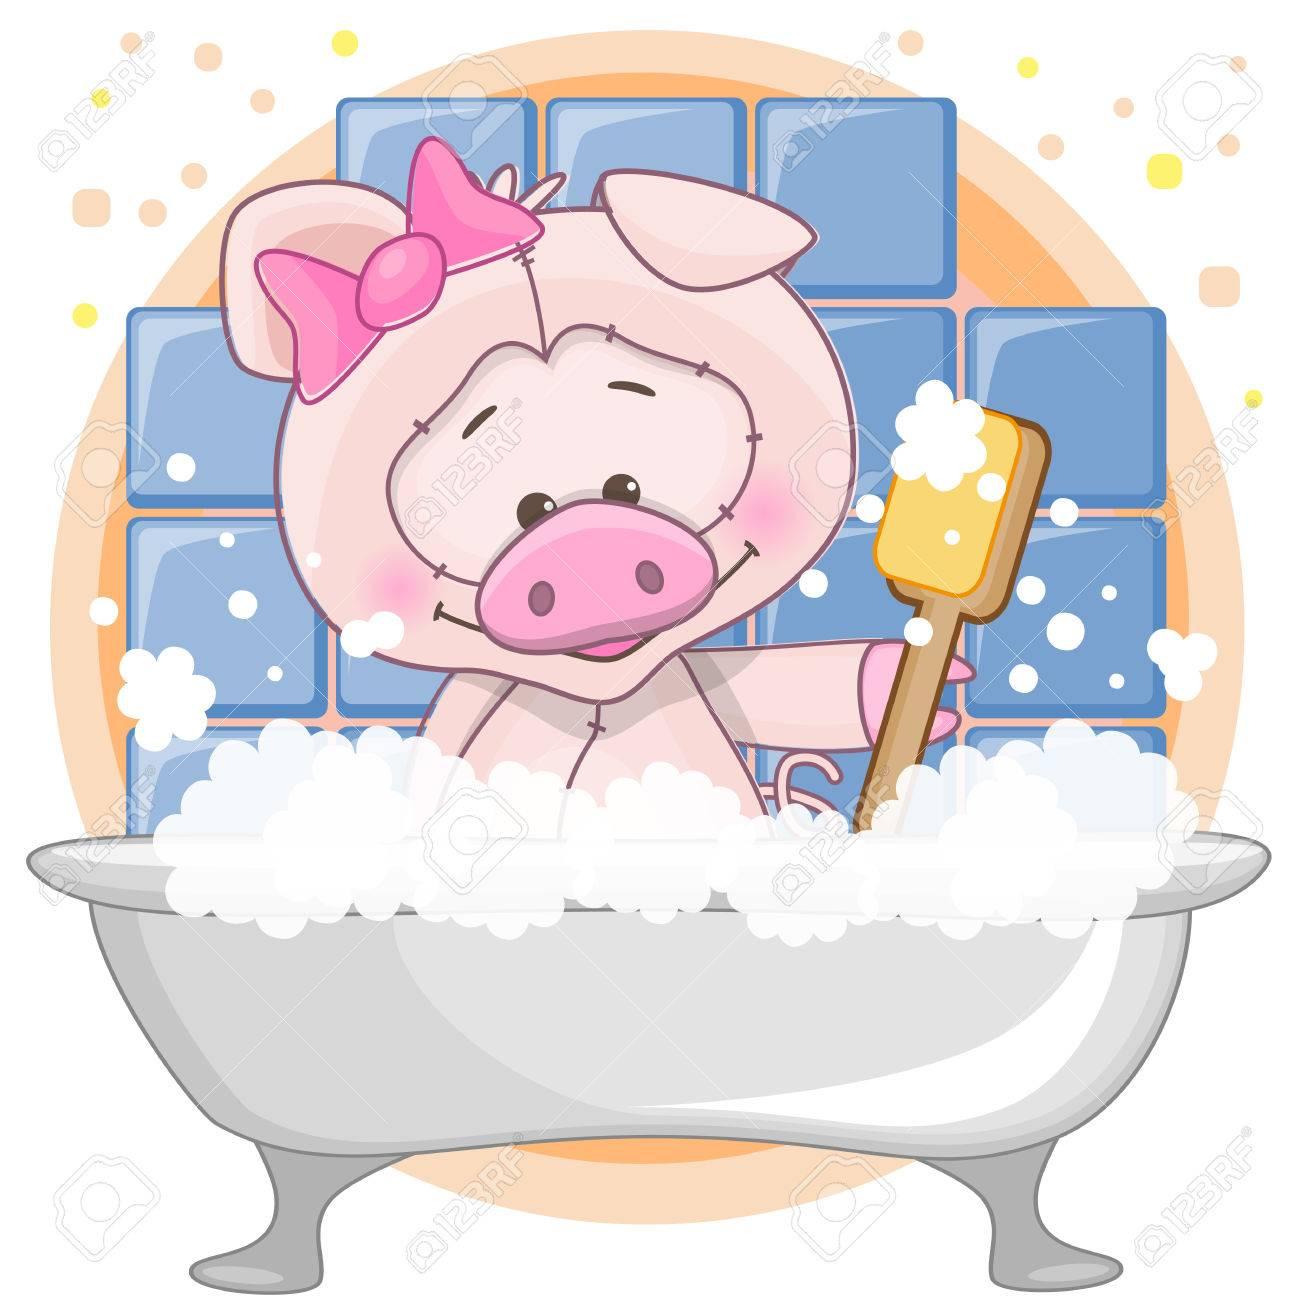 Cute Cartoon Pig In The Bathroom Stock Vector